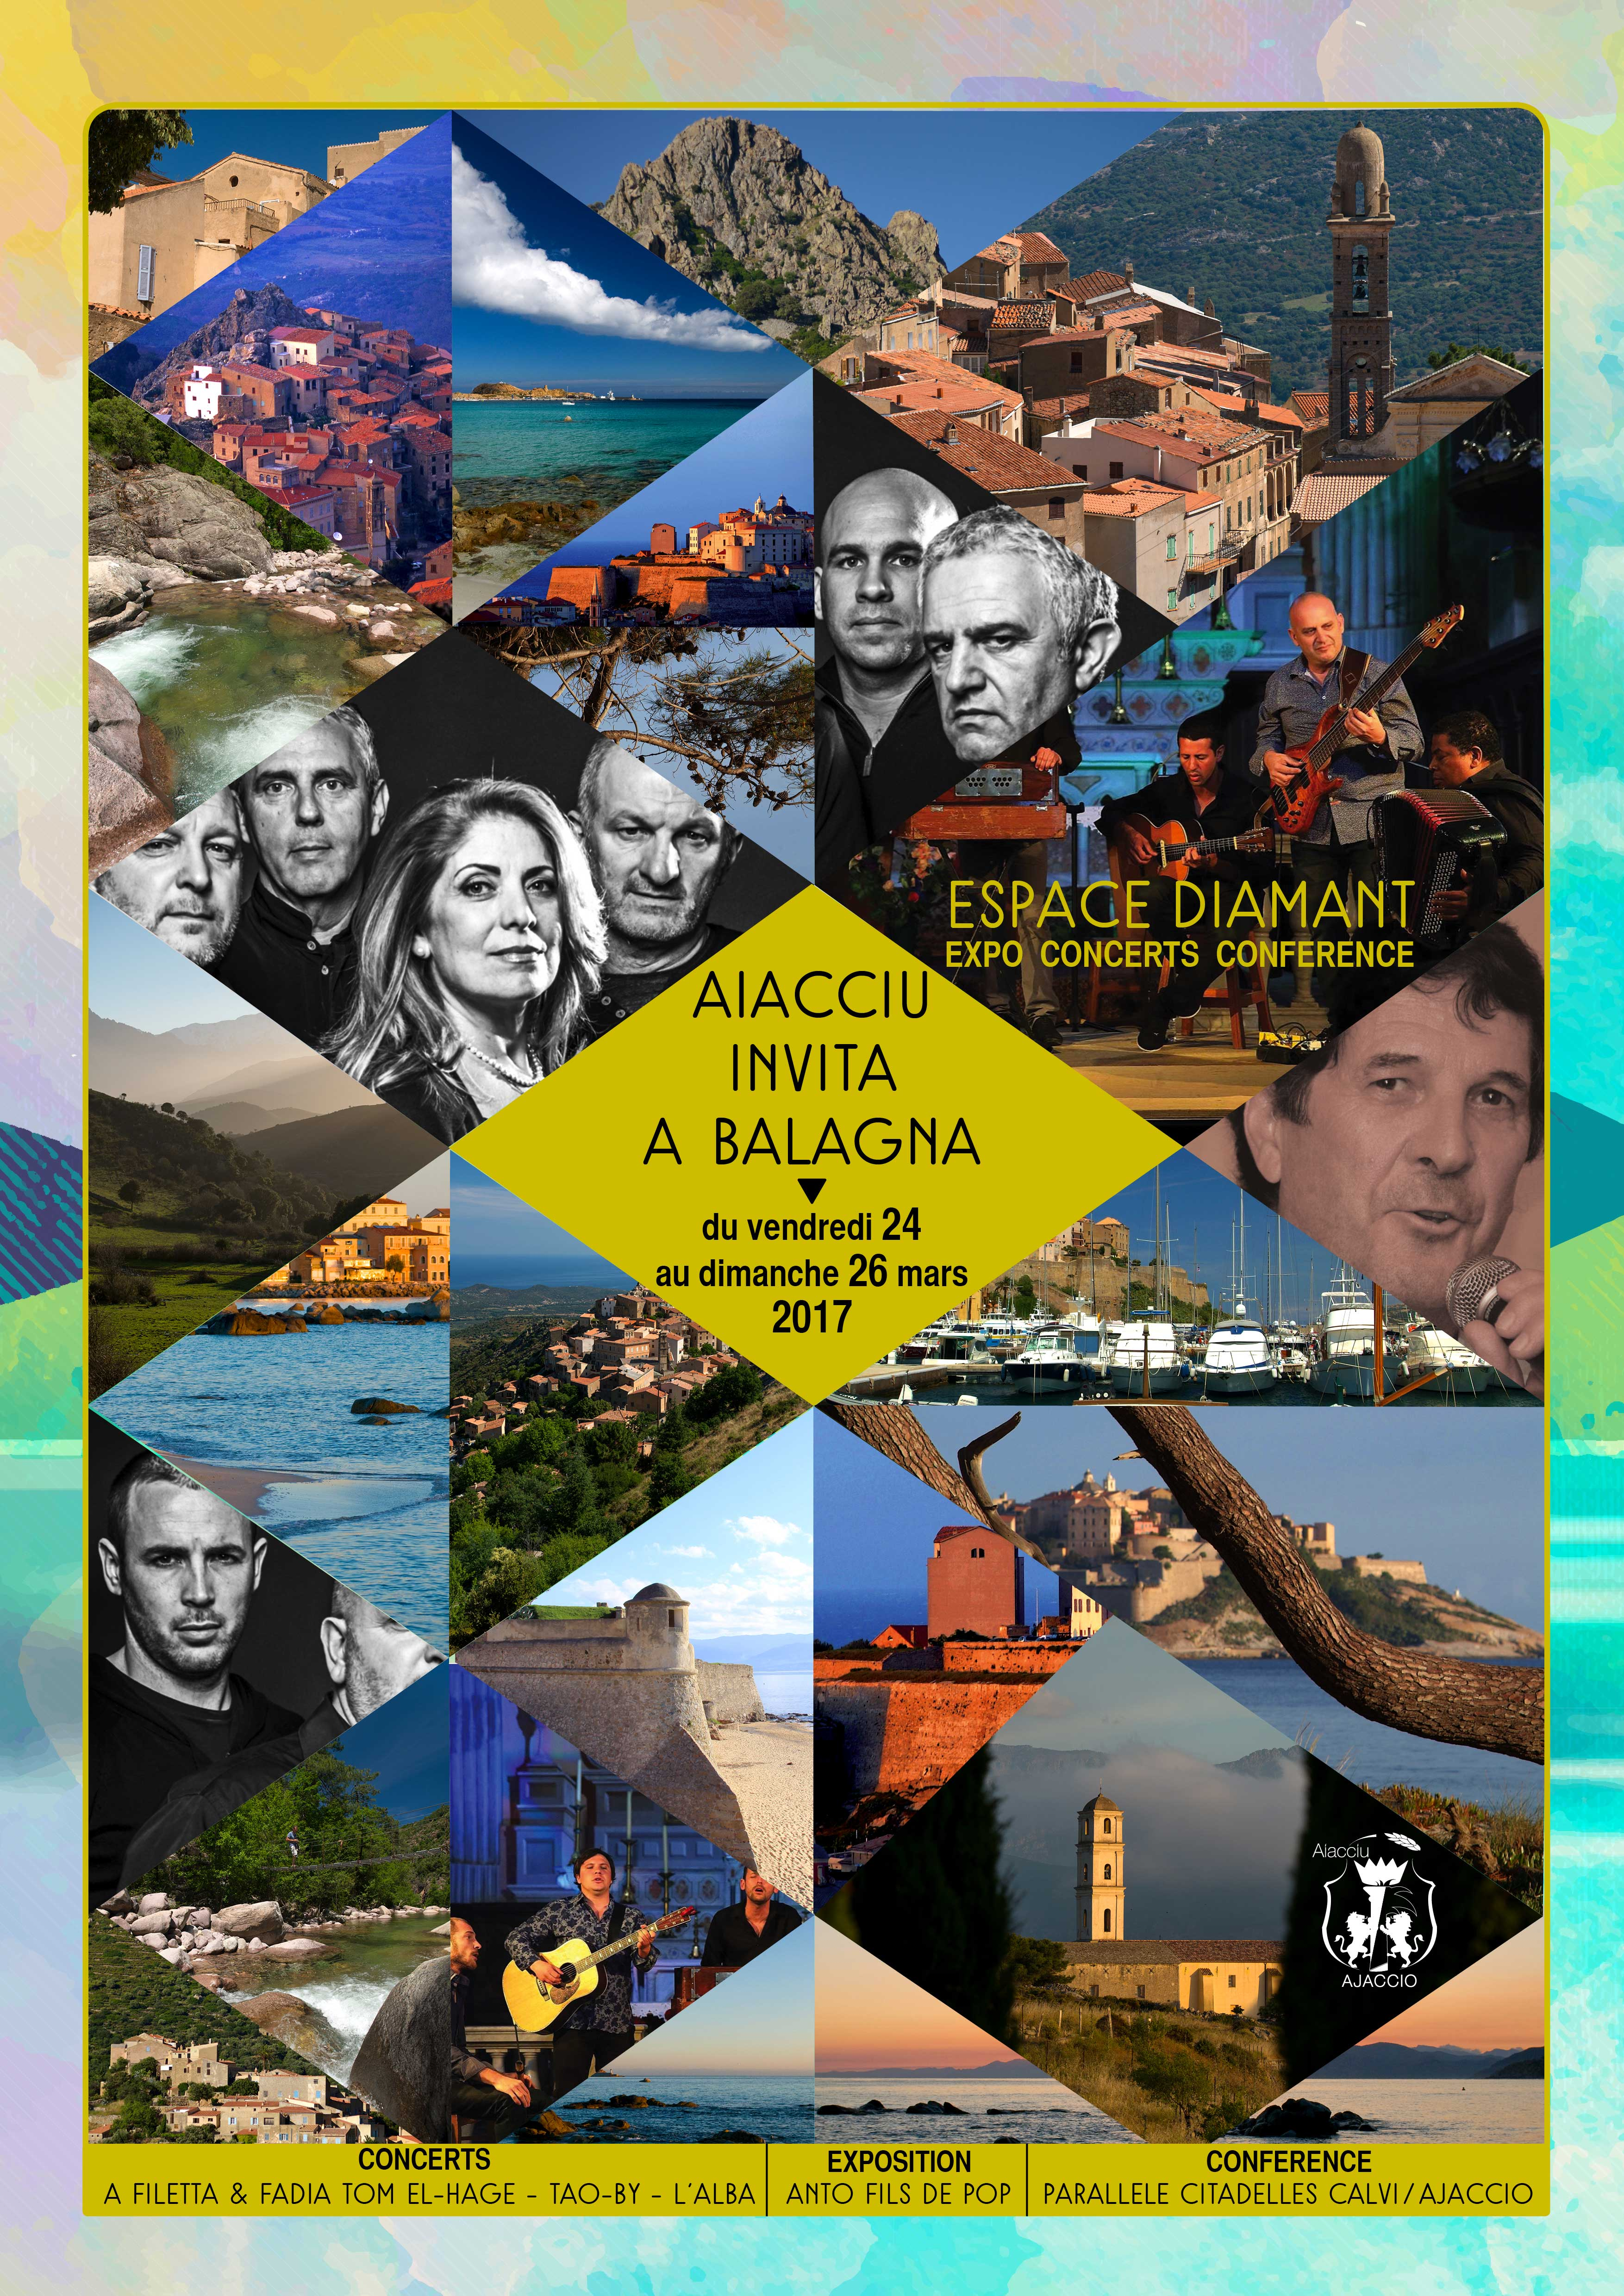 Concerts, Exposition, conférences... Ajaccio Invite la Balagne